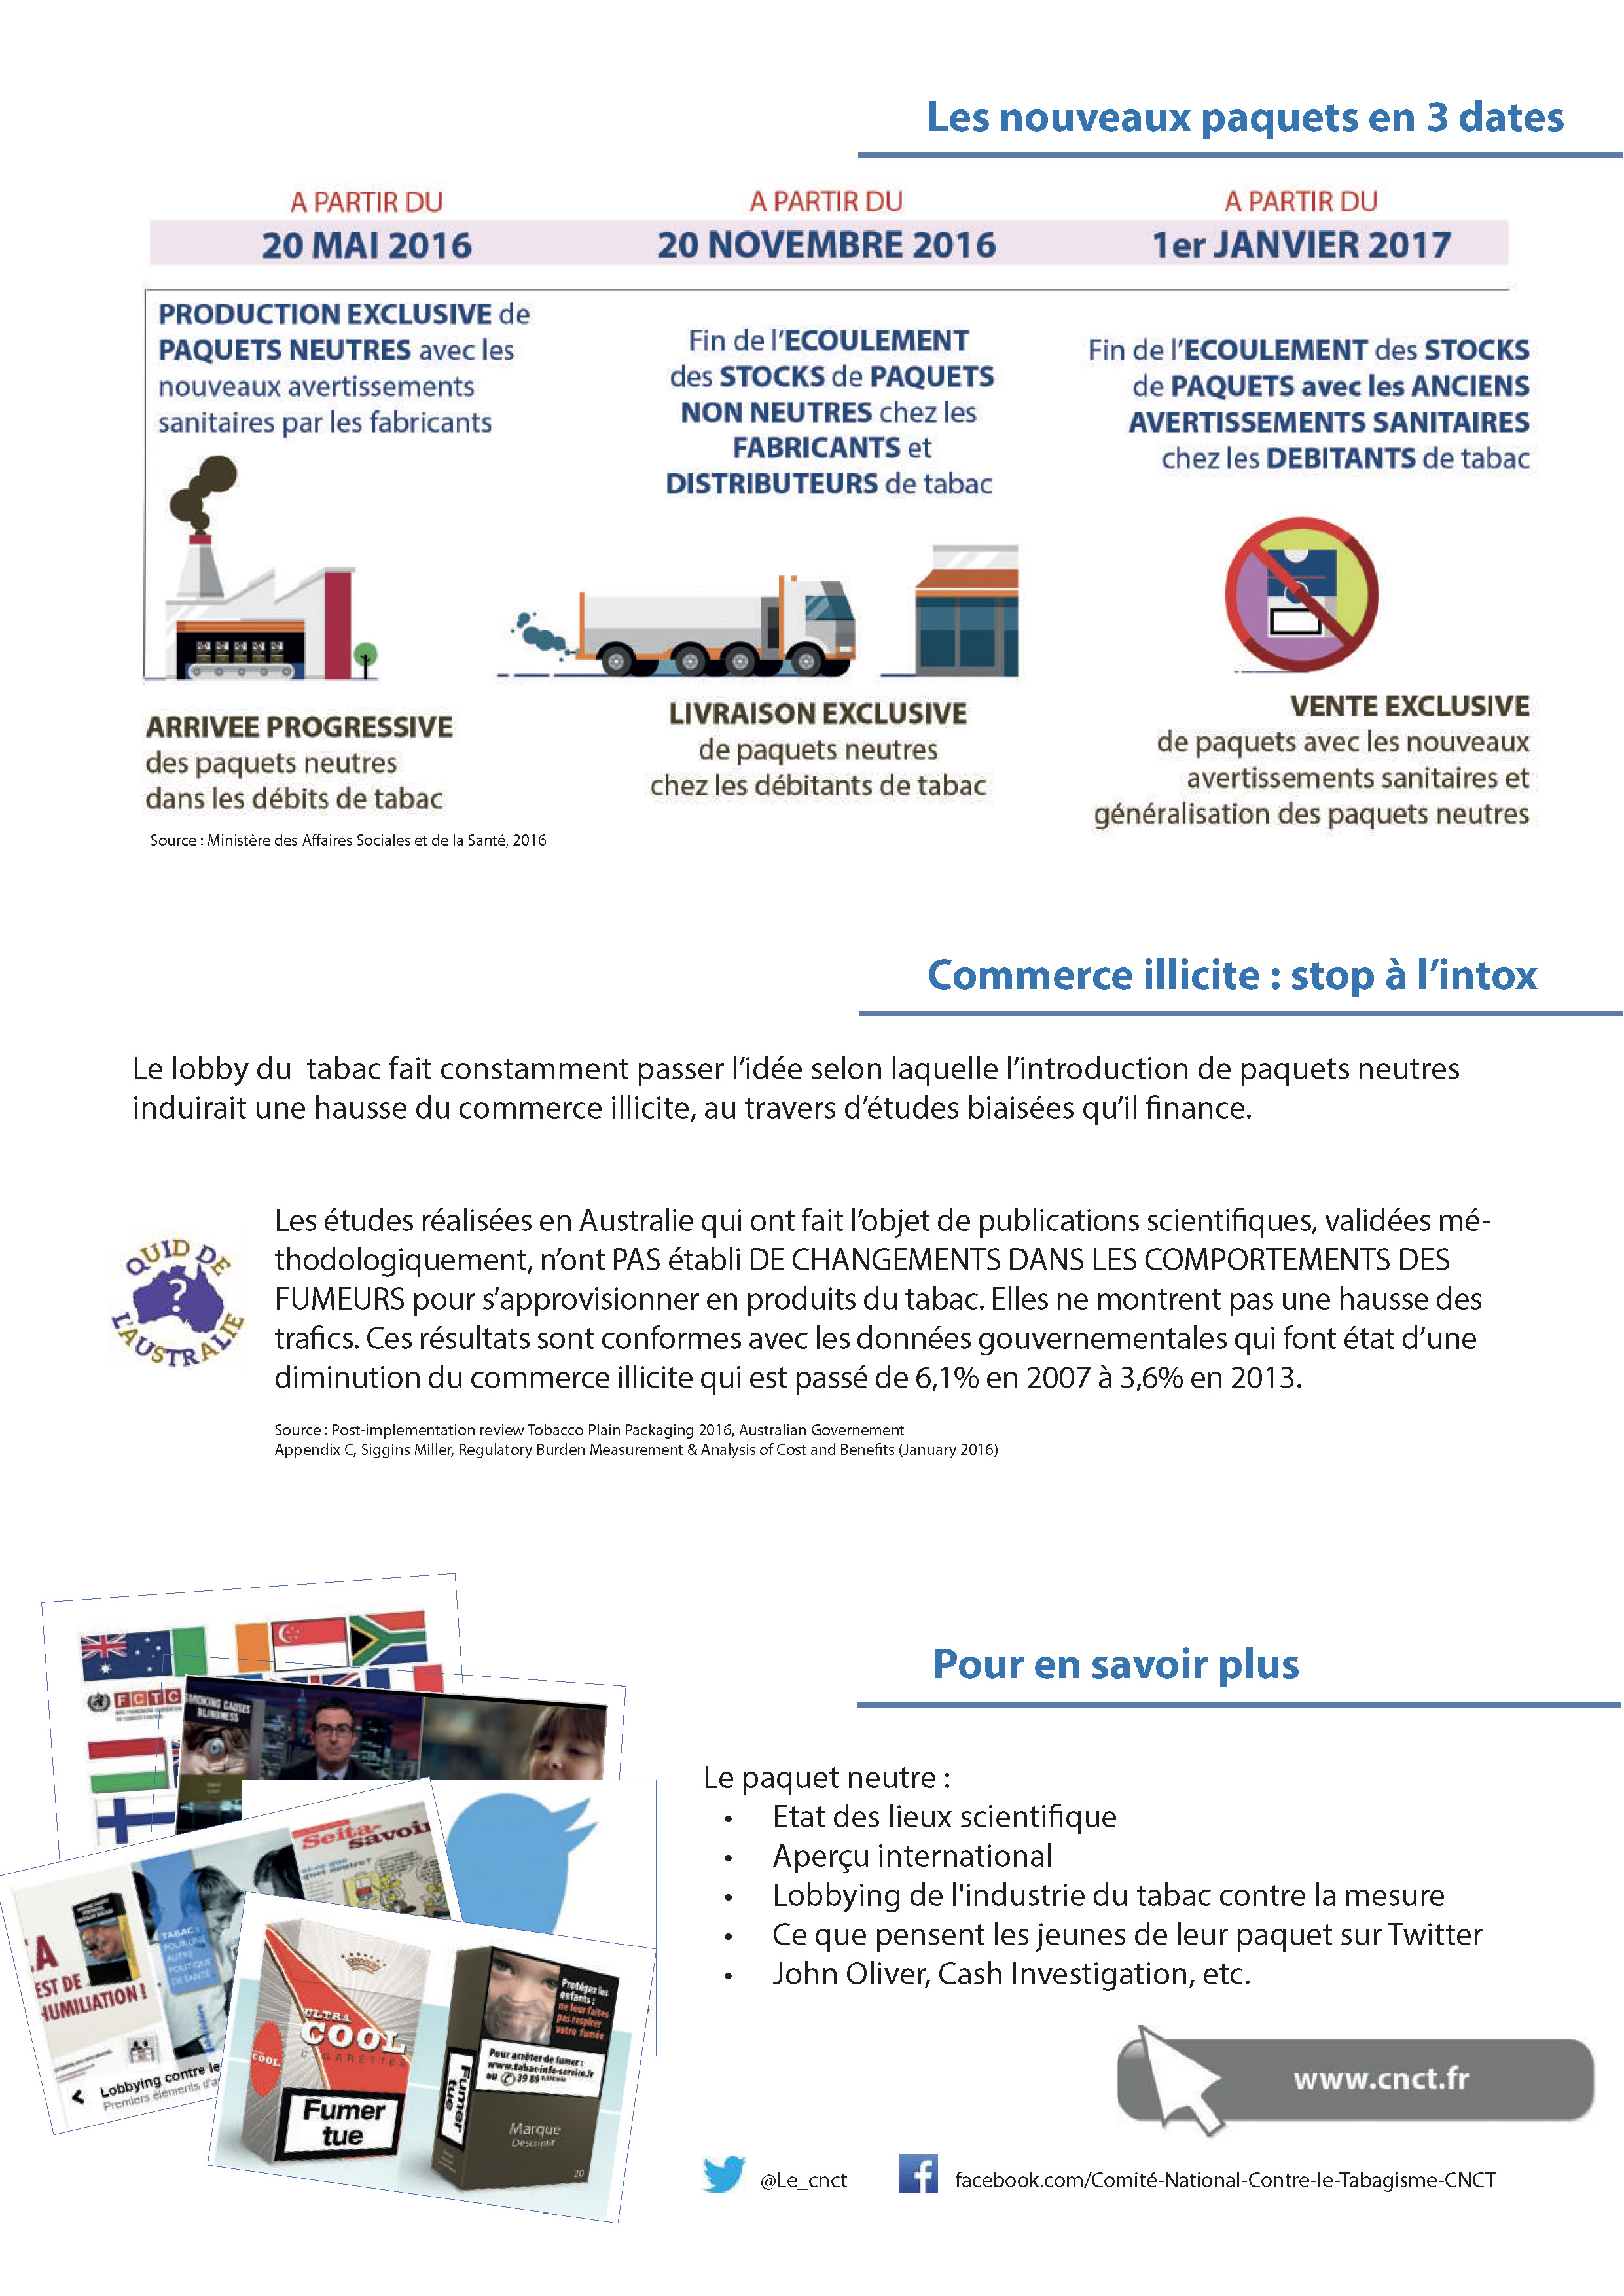 Alliance-DP_journee-mondiale-sans-tabac-avec-annexes-vf-30mai2016_Page_15.jpg